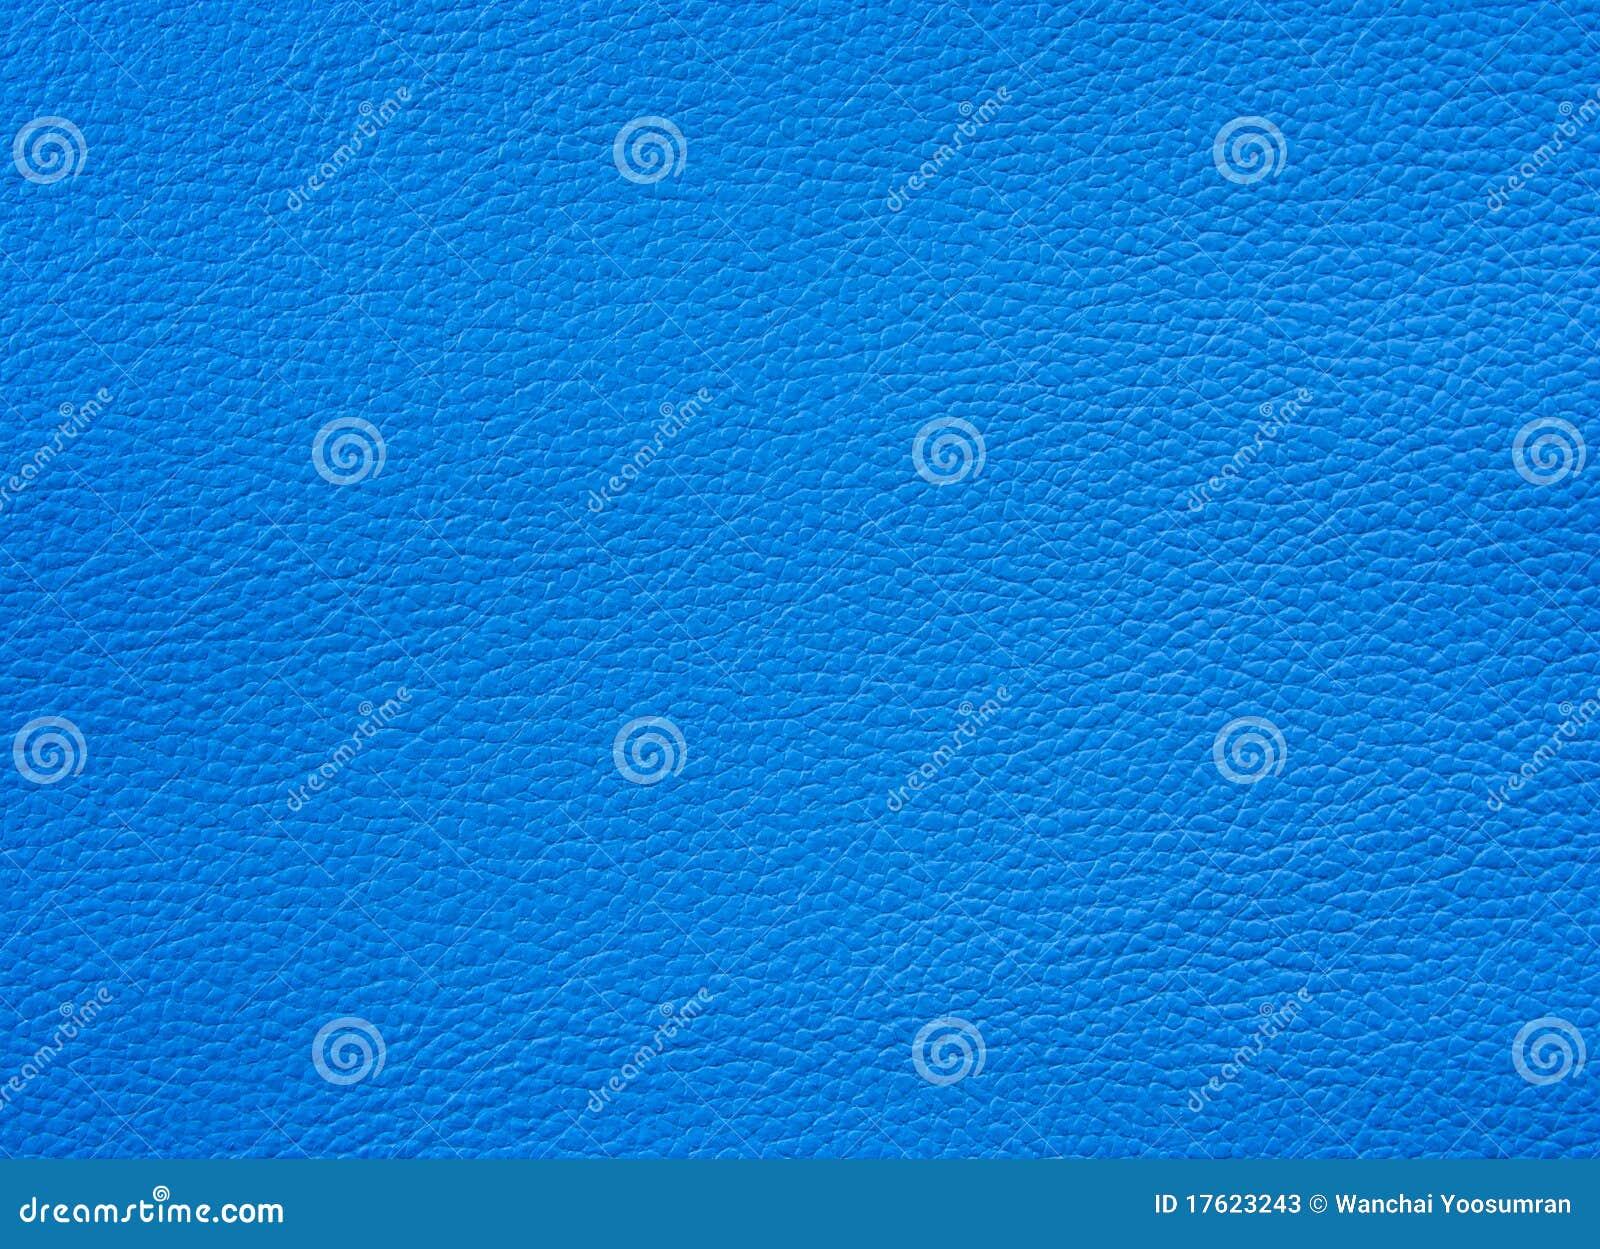 light blue leather background - photo #3